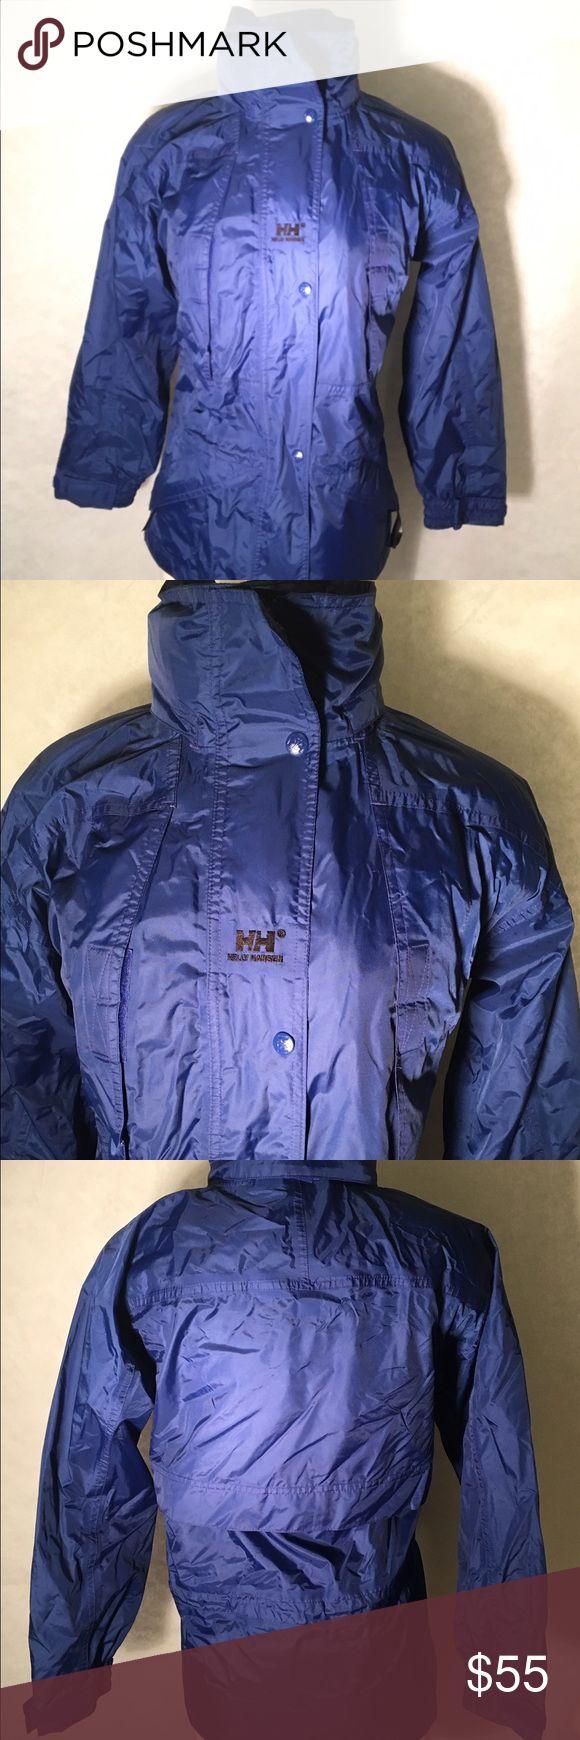 Helly Hansen Excellent Condition Helly Hansen Jackets & Coats